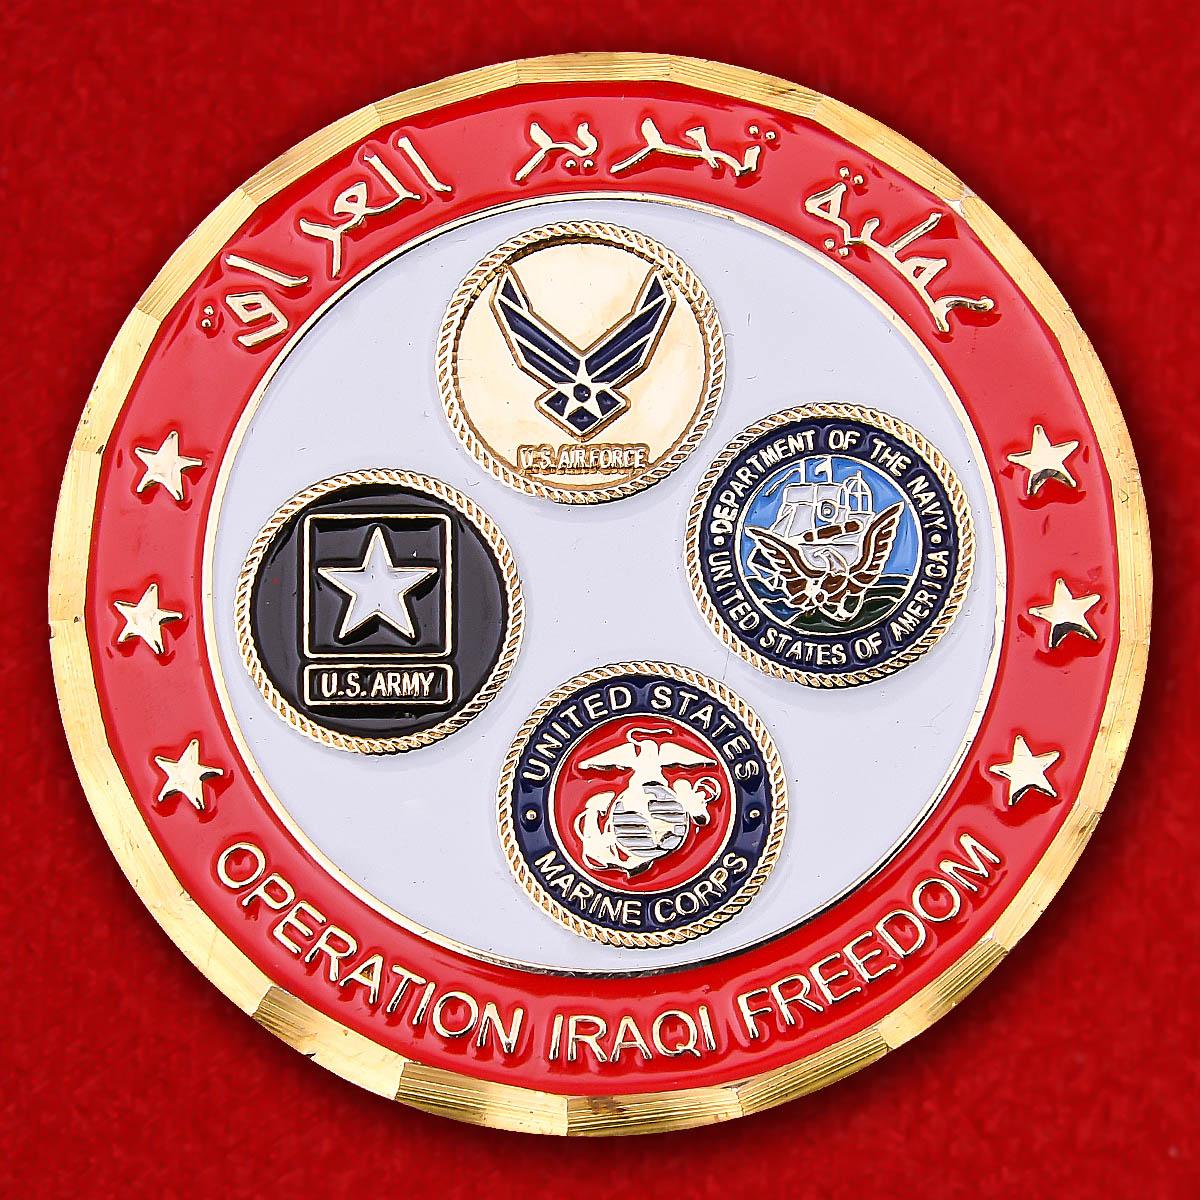 NATO Multinational Corps Operation Iraqi Freedom Challenge Coin